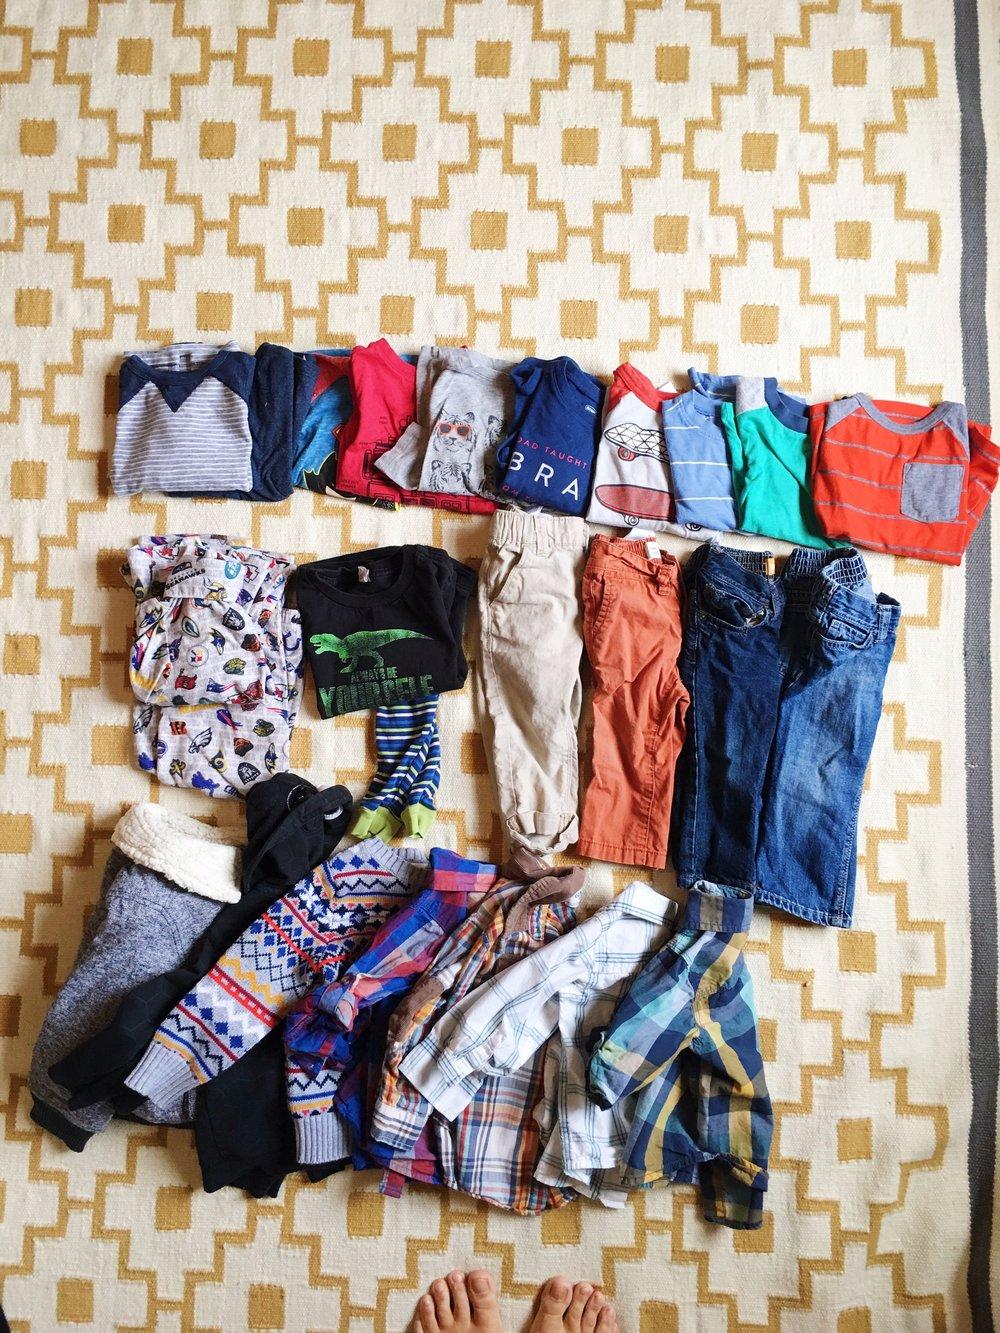 My 2-year-old's wardrobe.